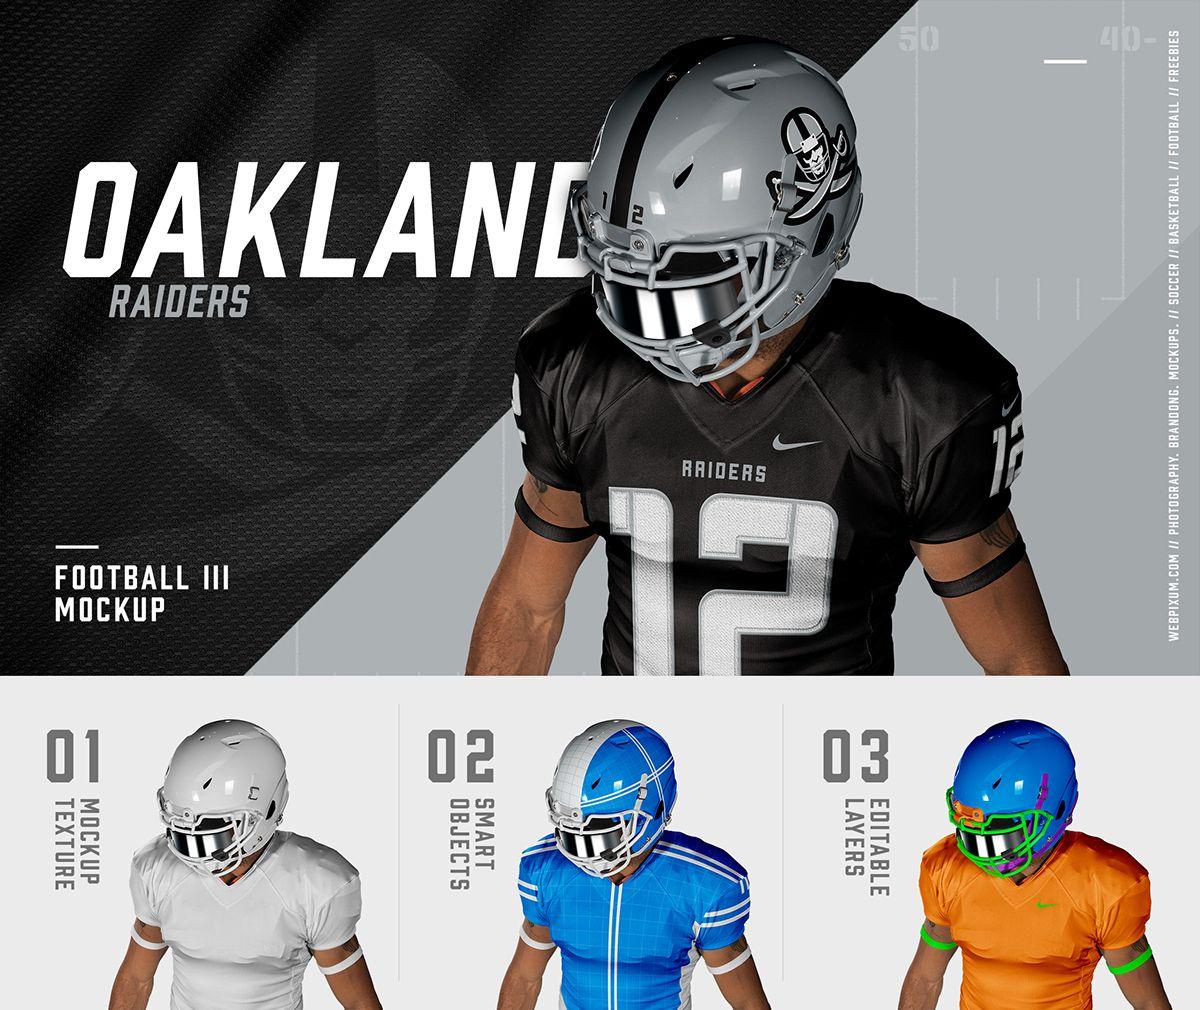 Download Nfl Football Mockups Psds 10 Sports Design Tips On Behance Sports Design Nfl Football Uniforms Football